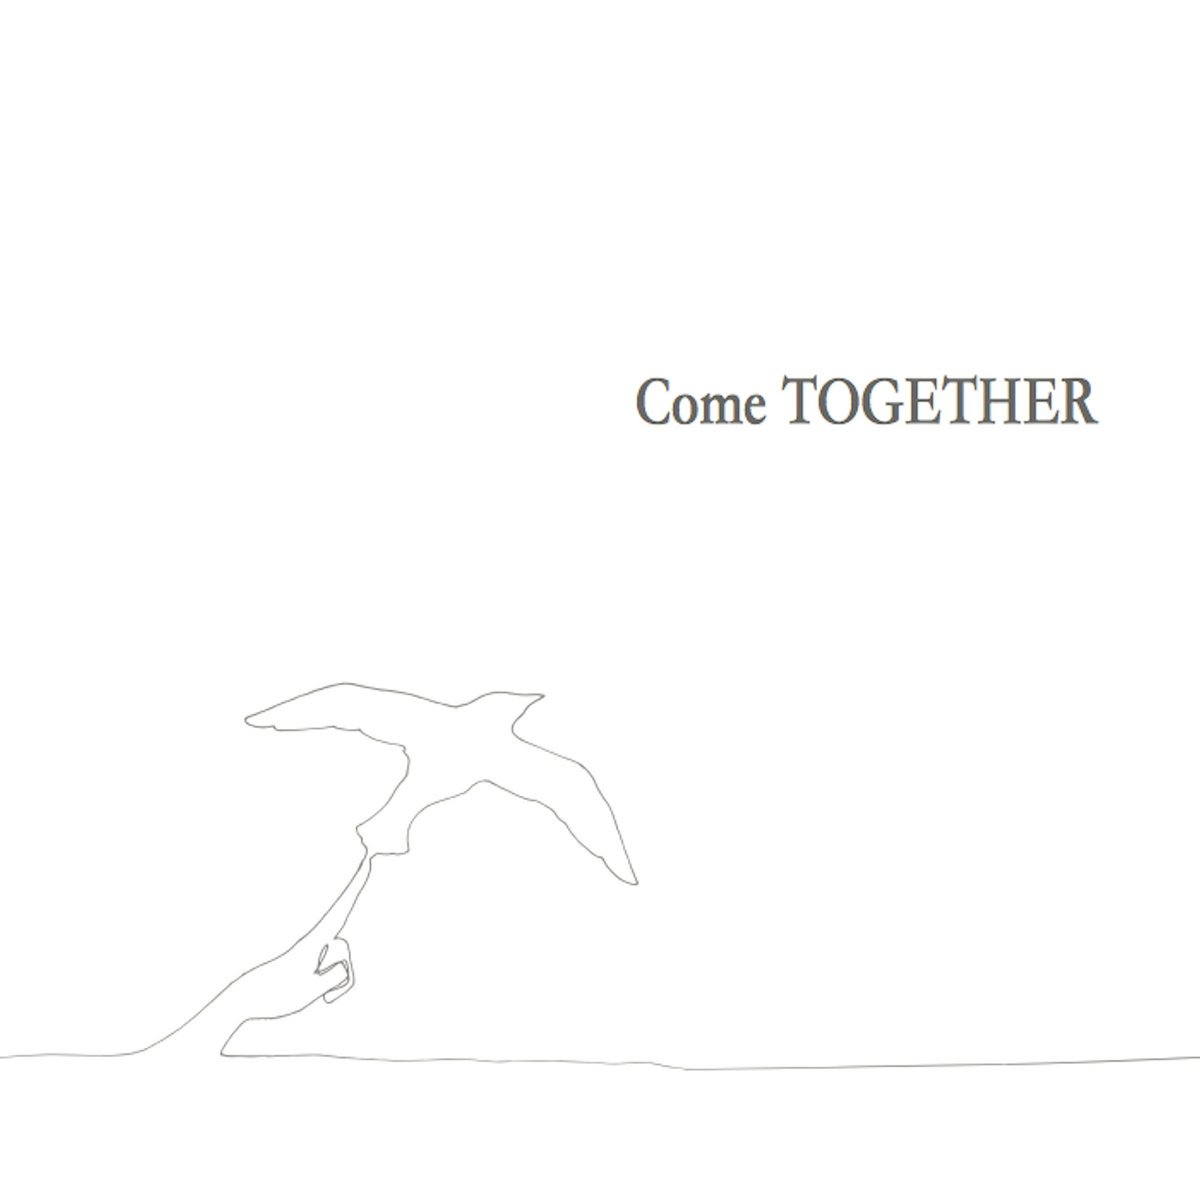 Brandon Ridenour - Come Together